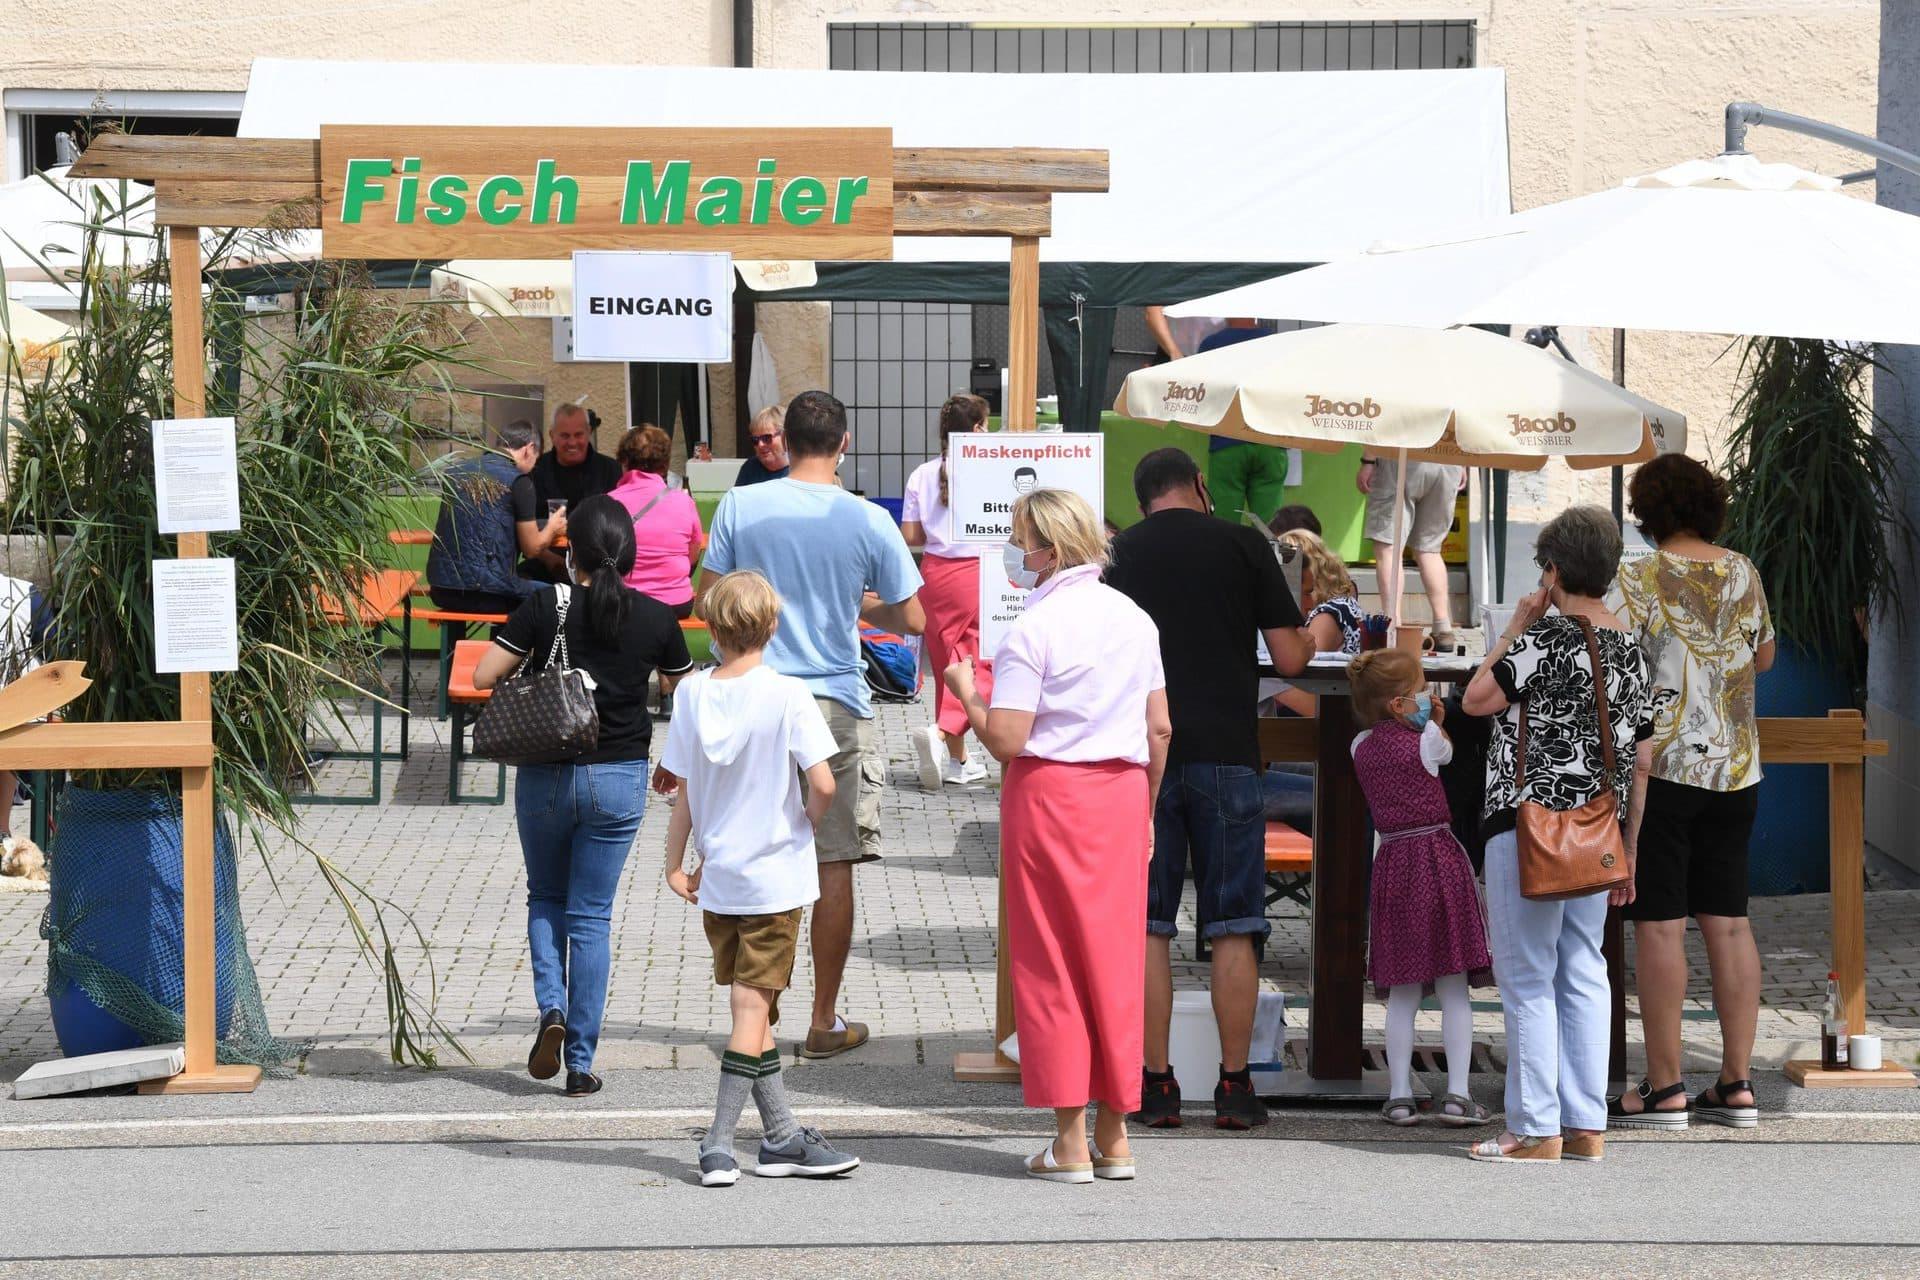 Dritte Runde für Fisch Maiers Hofwirtschaft Am 6. September nach Frengkofen